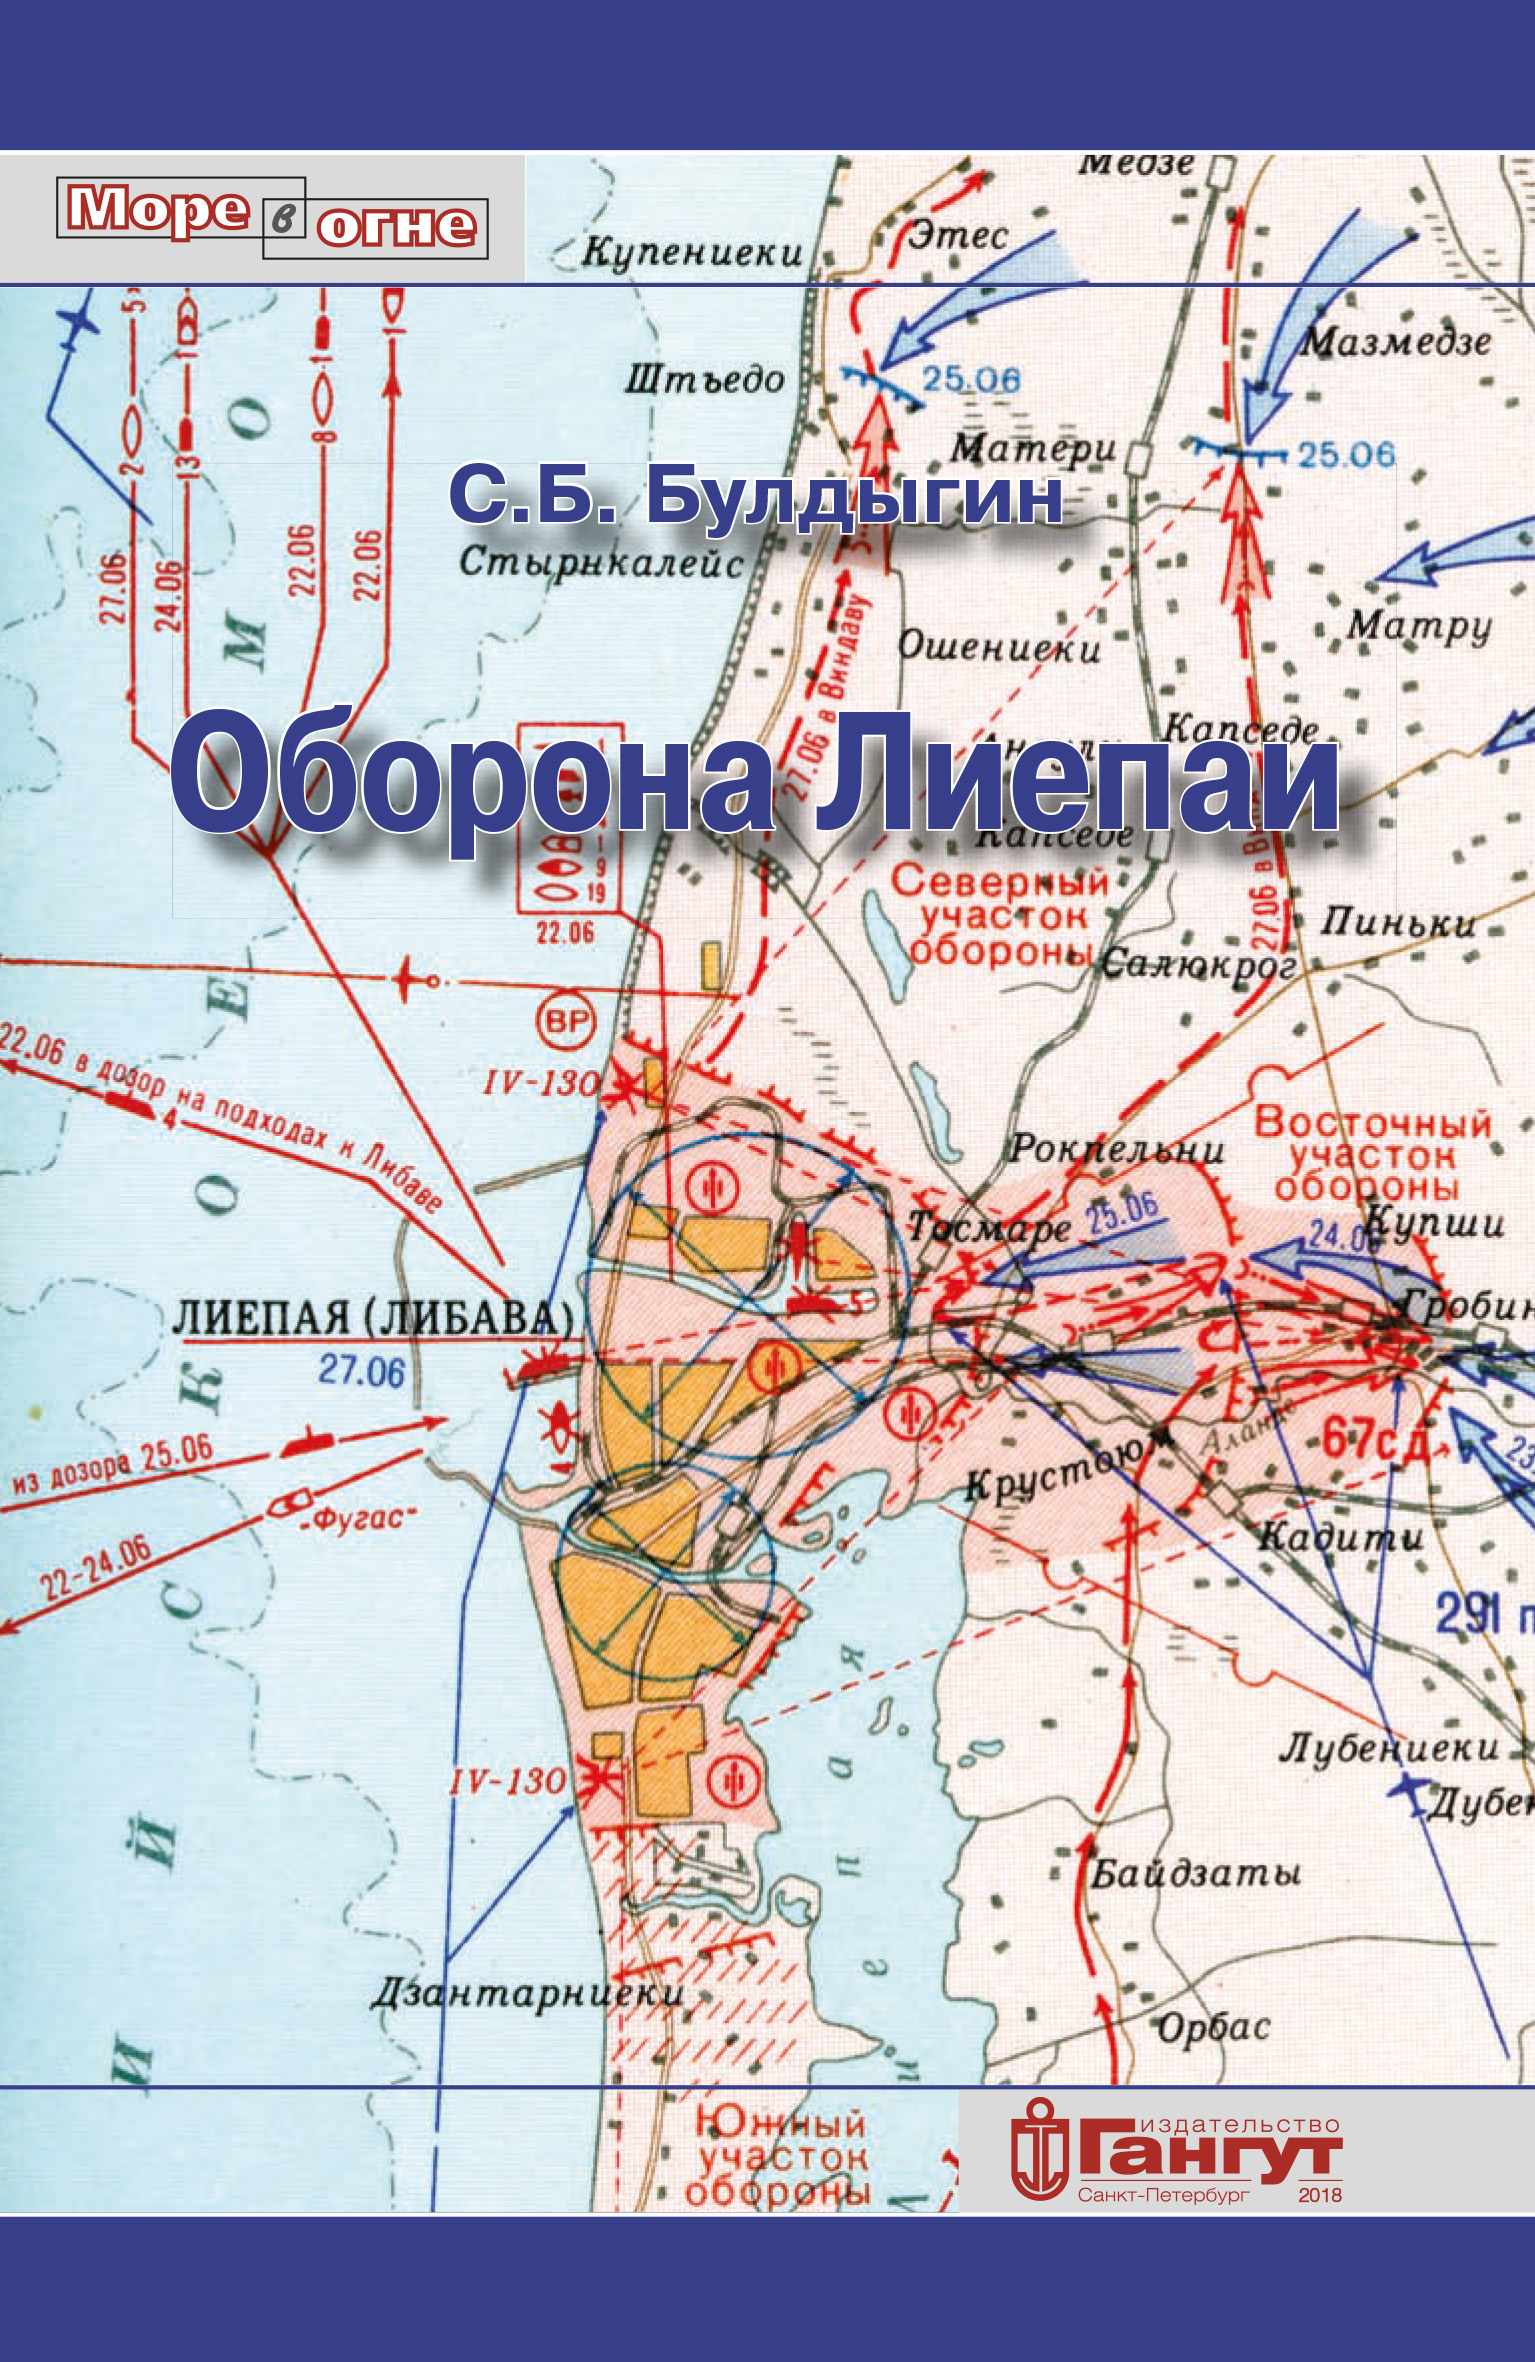 Оборона Лиепаи (июнь 1941)